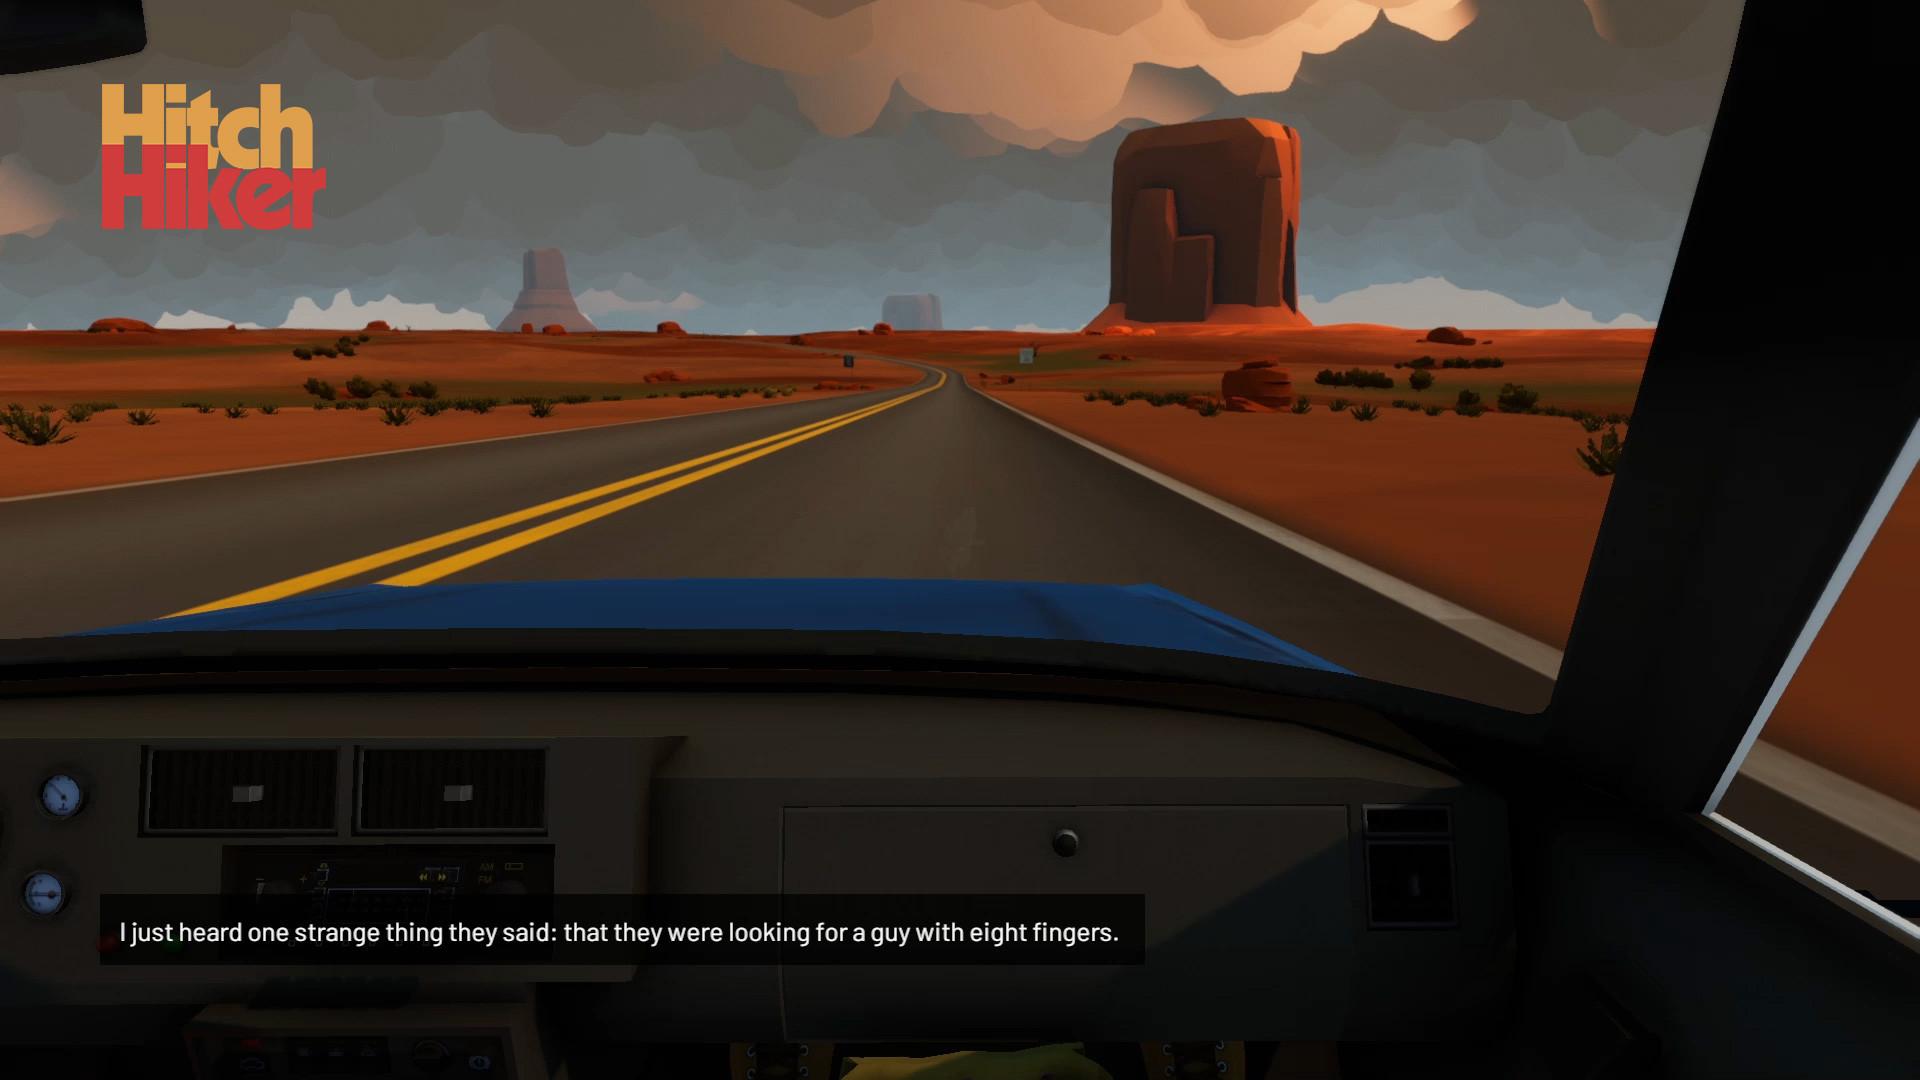 Hitchhiker - A Mystery Game PC Key Fiyatları